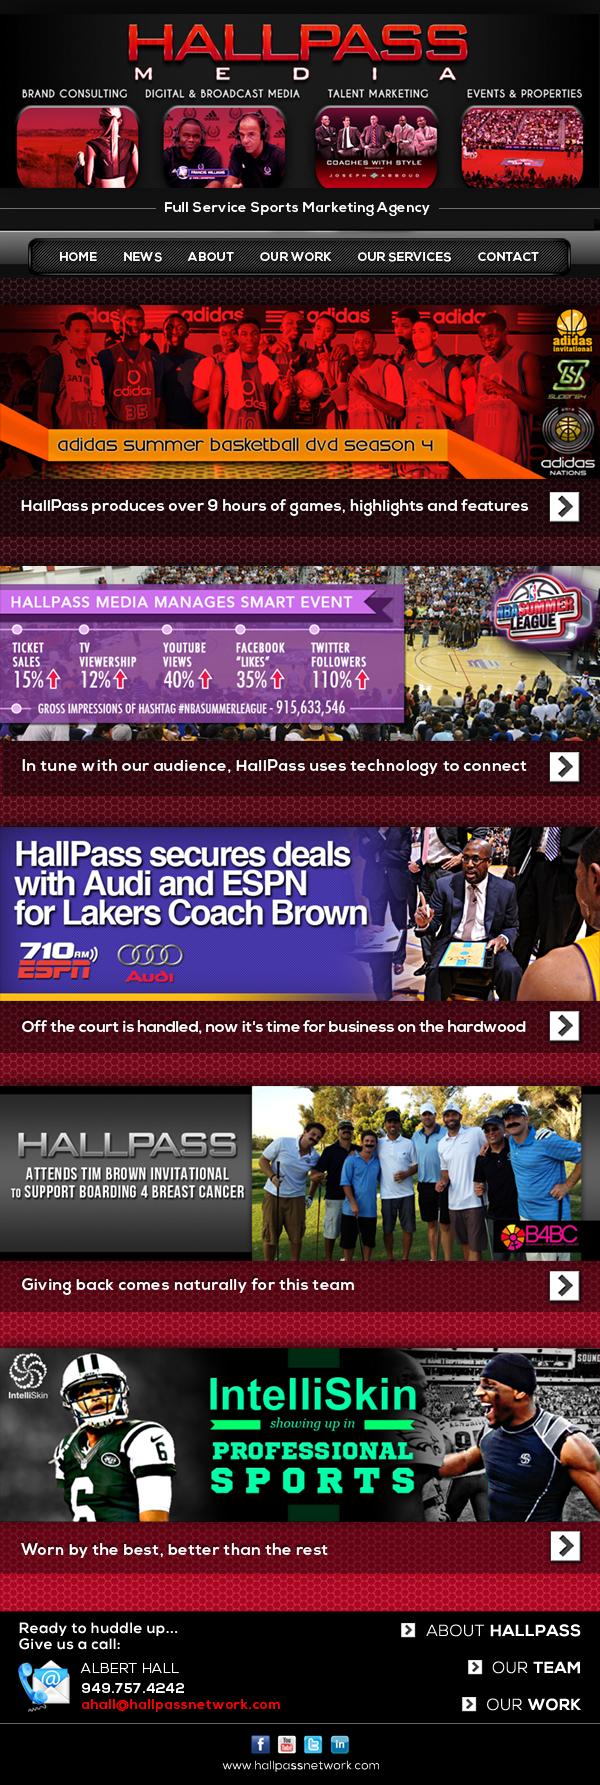 HallPass October Newsletter